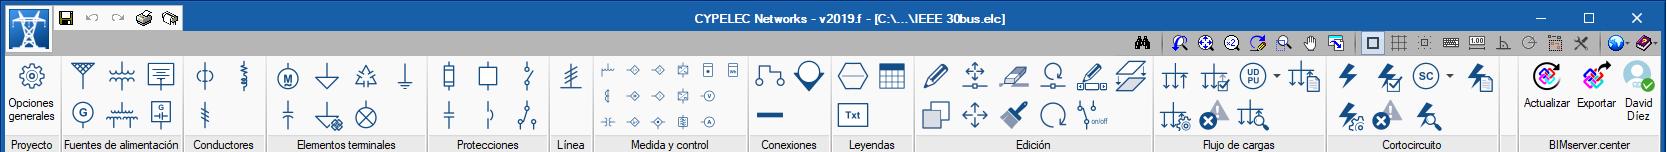 CYPELEC Networks. Interfaz